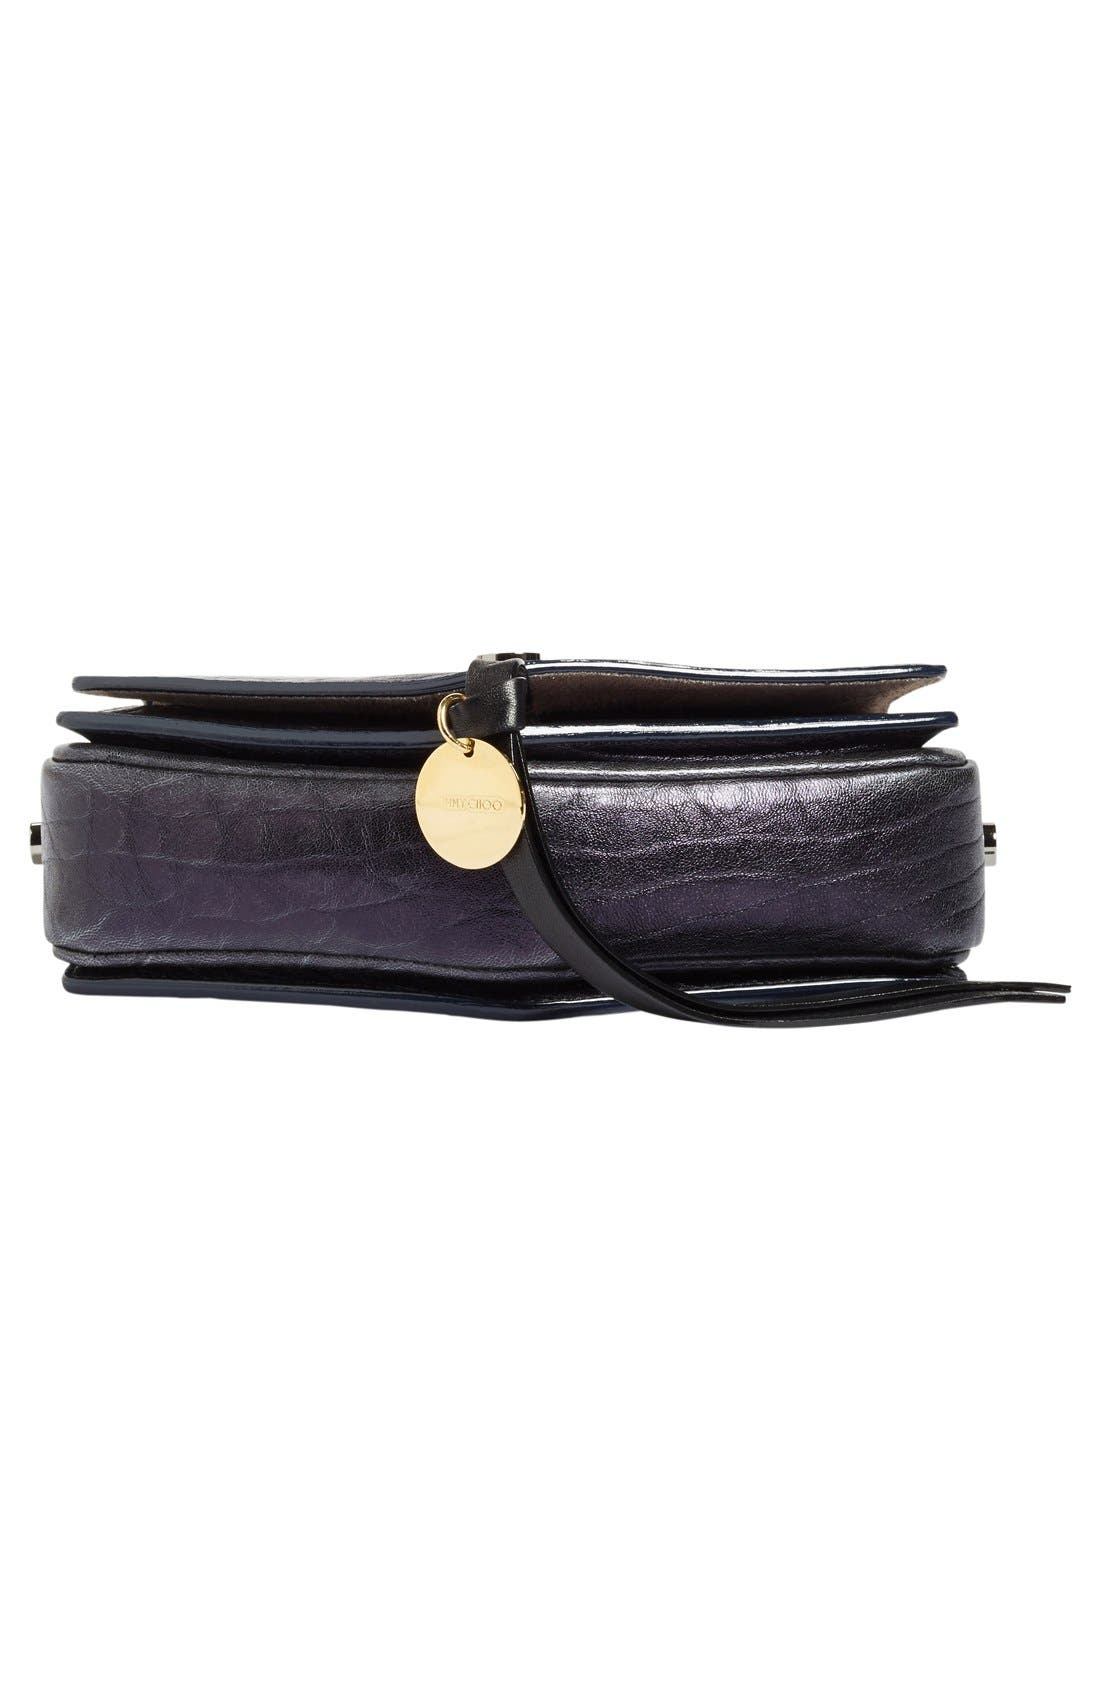 Arrow Metallic Grained Leather Shoulder Bag,                             Alternate thumbnail 6, color,                             Navy